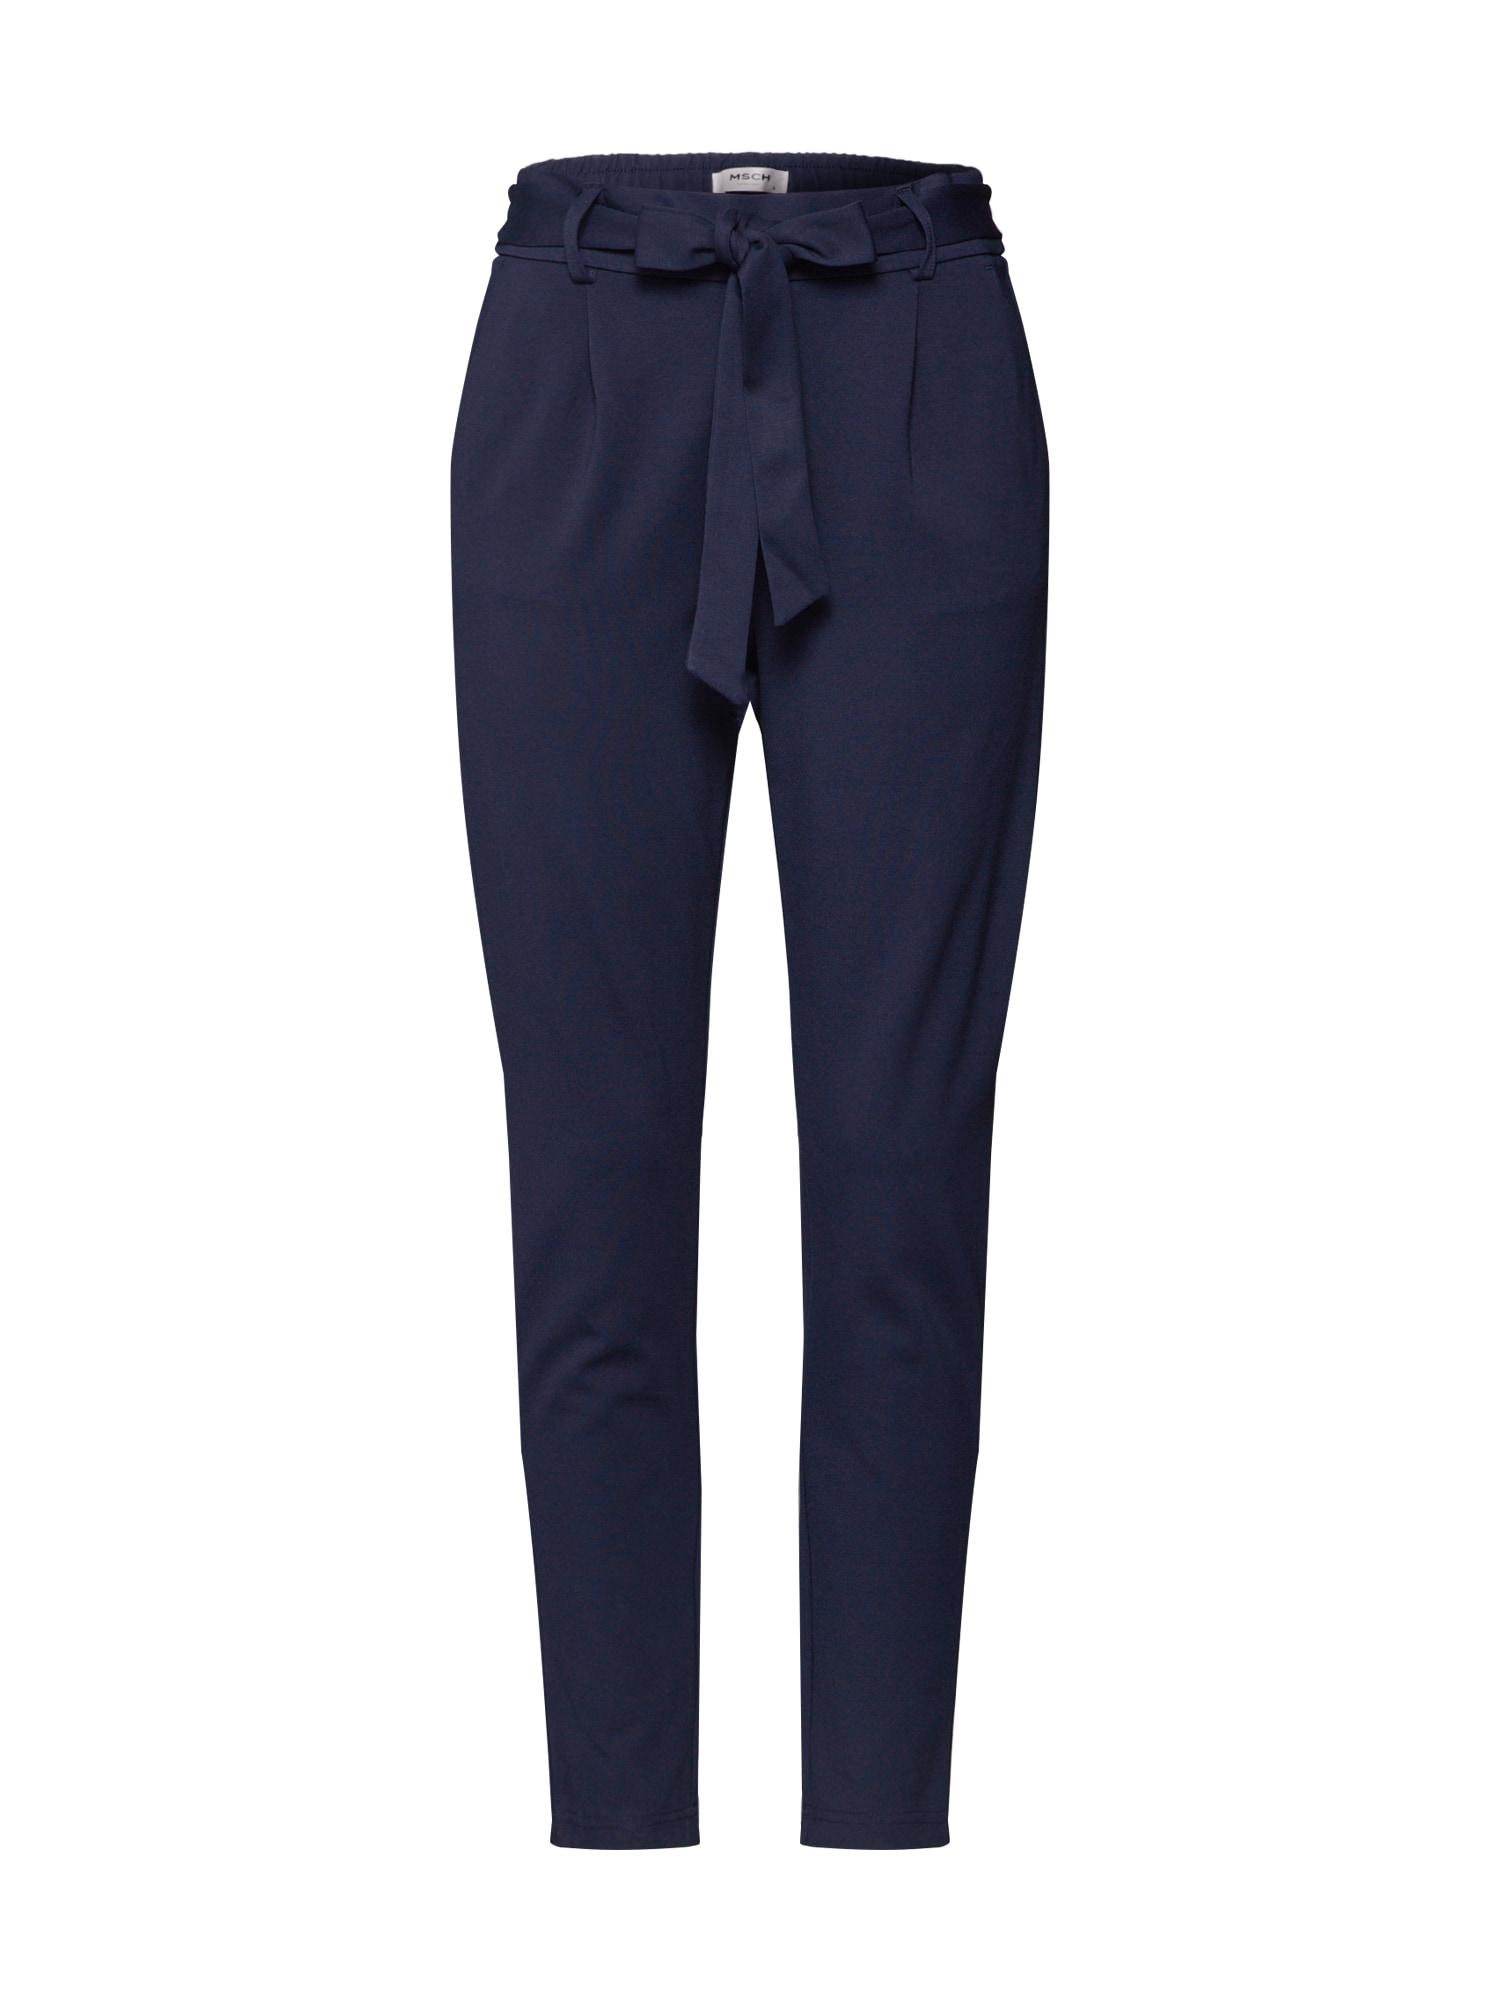 MOSS COPENHAGEN Klostuotos kelnės 'Popye' mėlyna